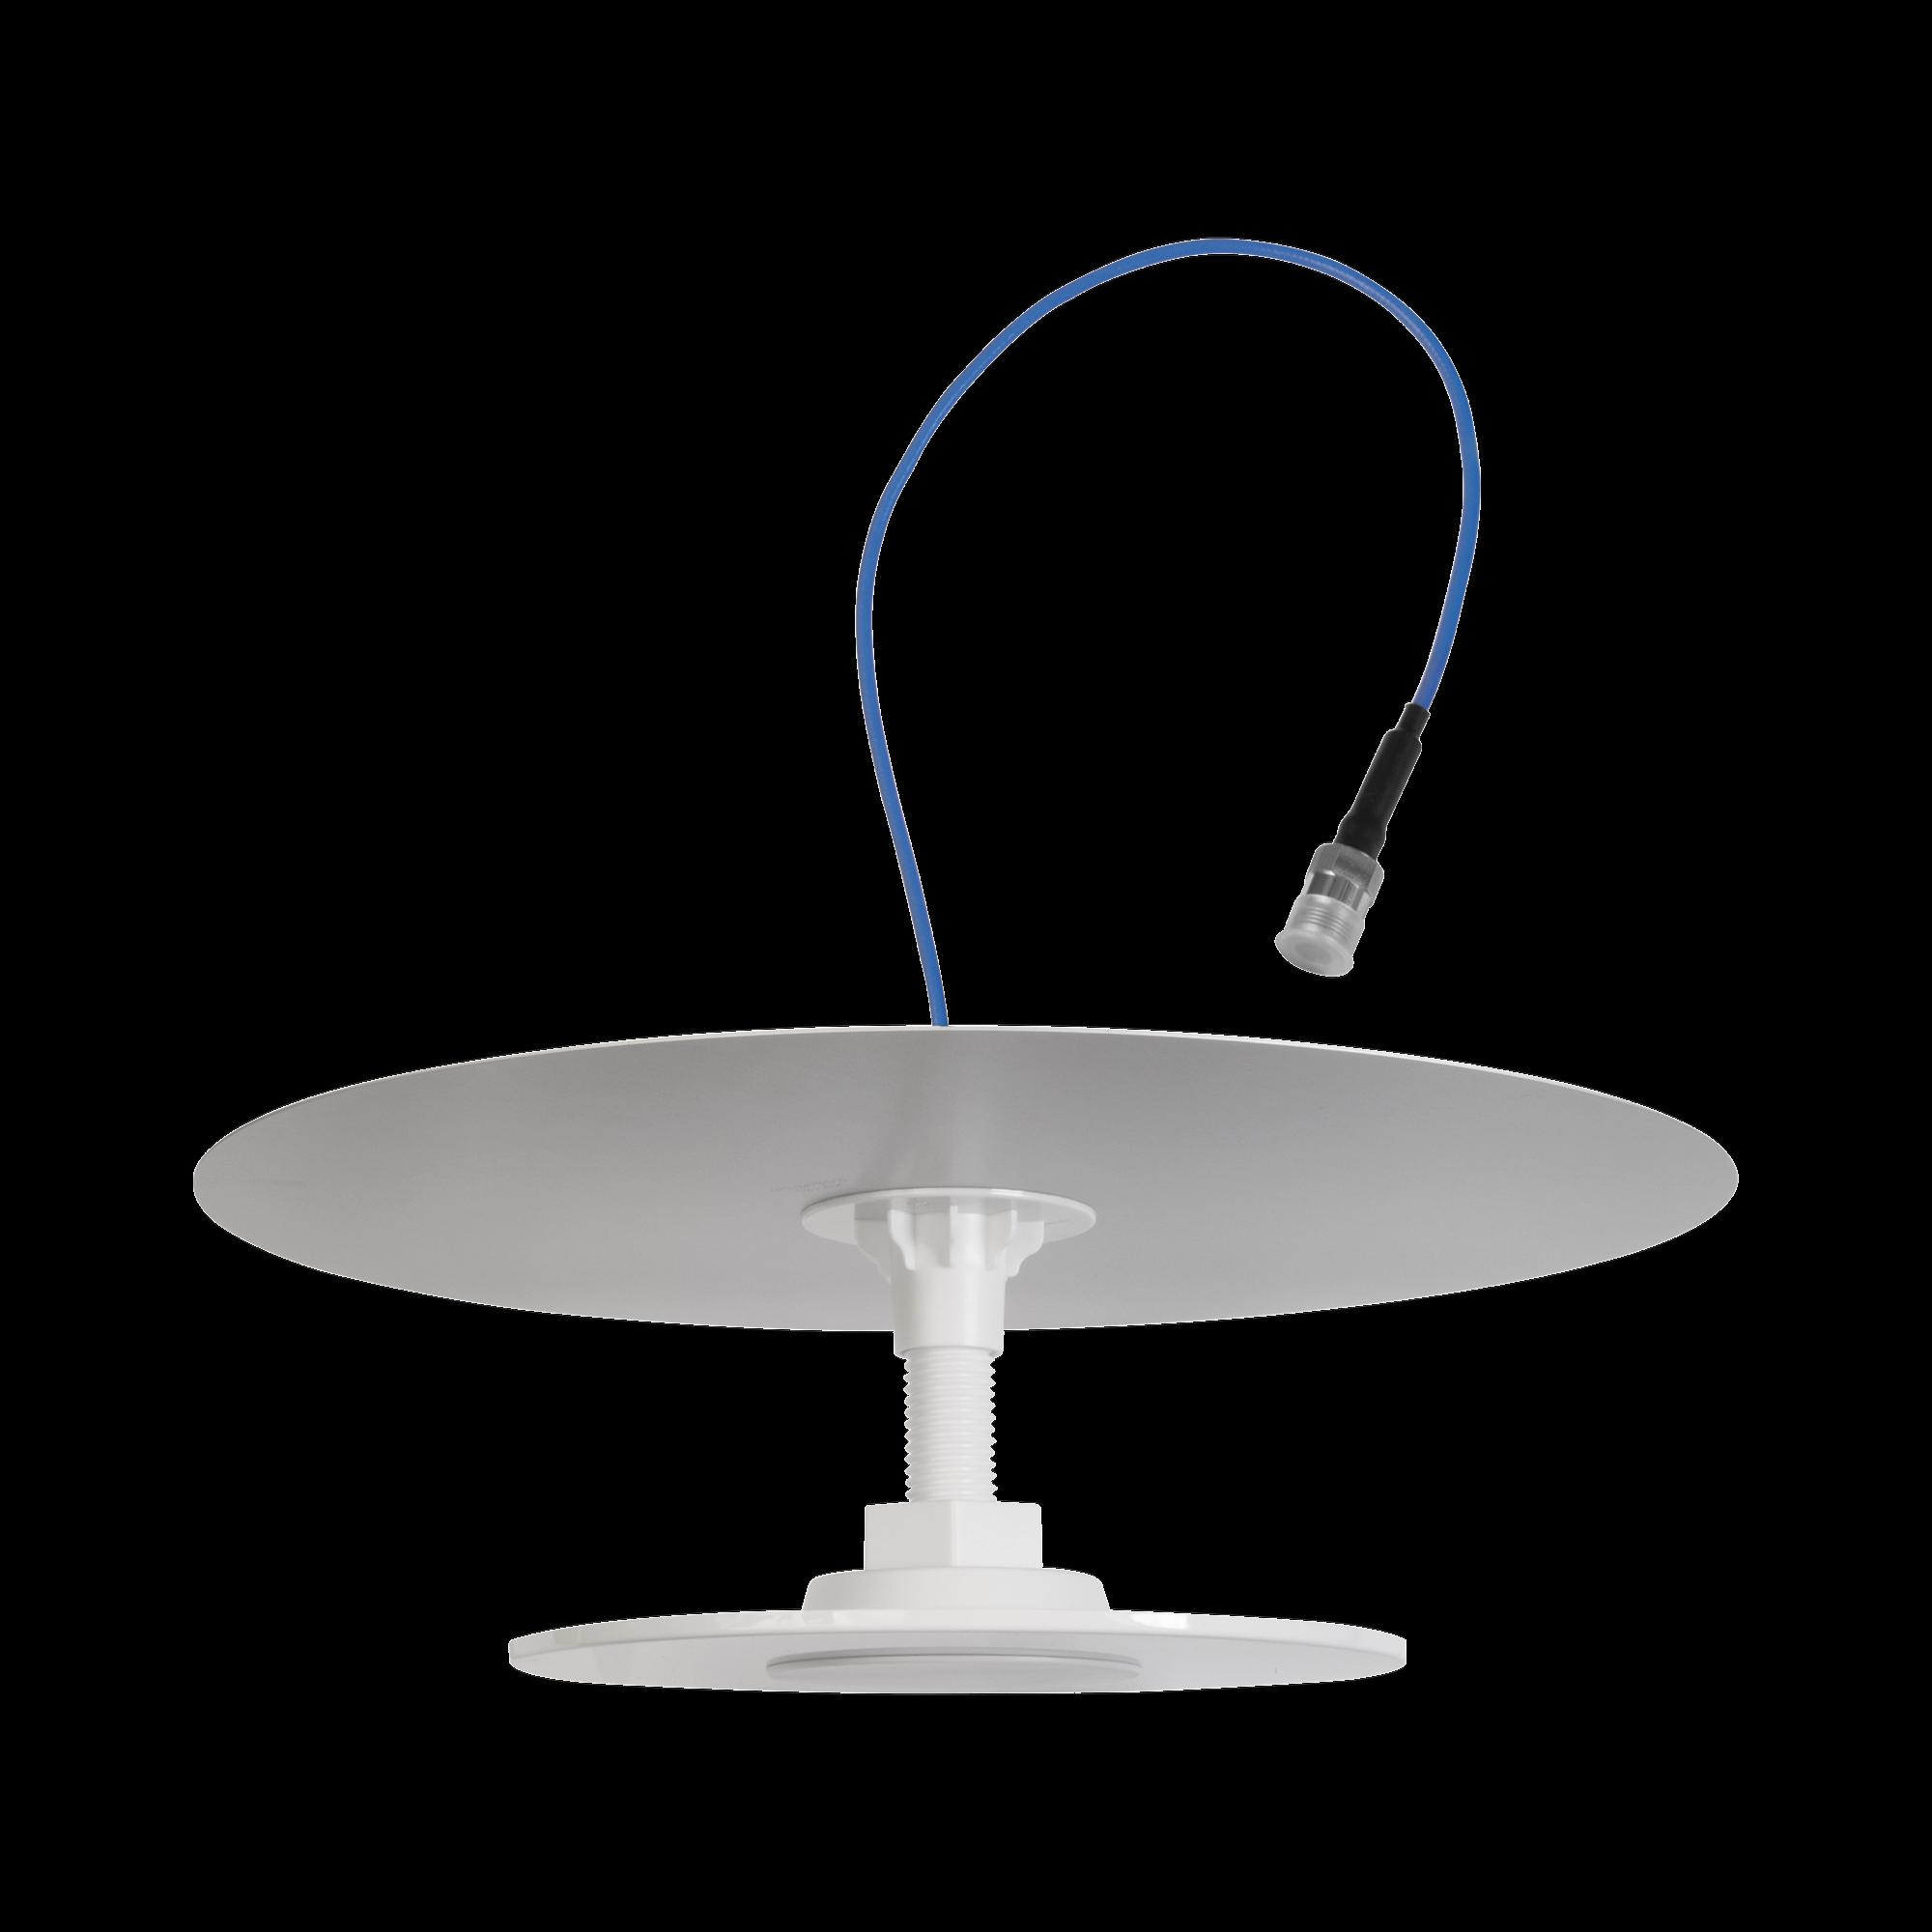 Antena Omnidireccional de Bajo Perfil Ultra Delgada con Reflector para Máxima Ganancia| Cubre bandas de celular 4G, 3G y WiFi de 608 a 2700 MHz | Ganancia de 7 dBi